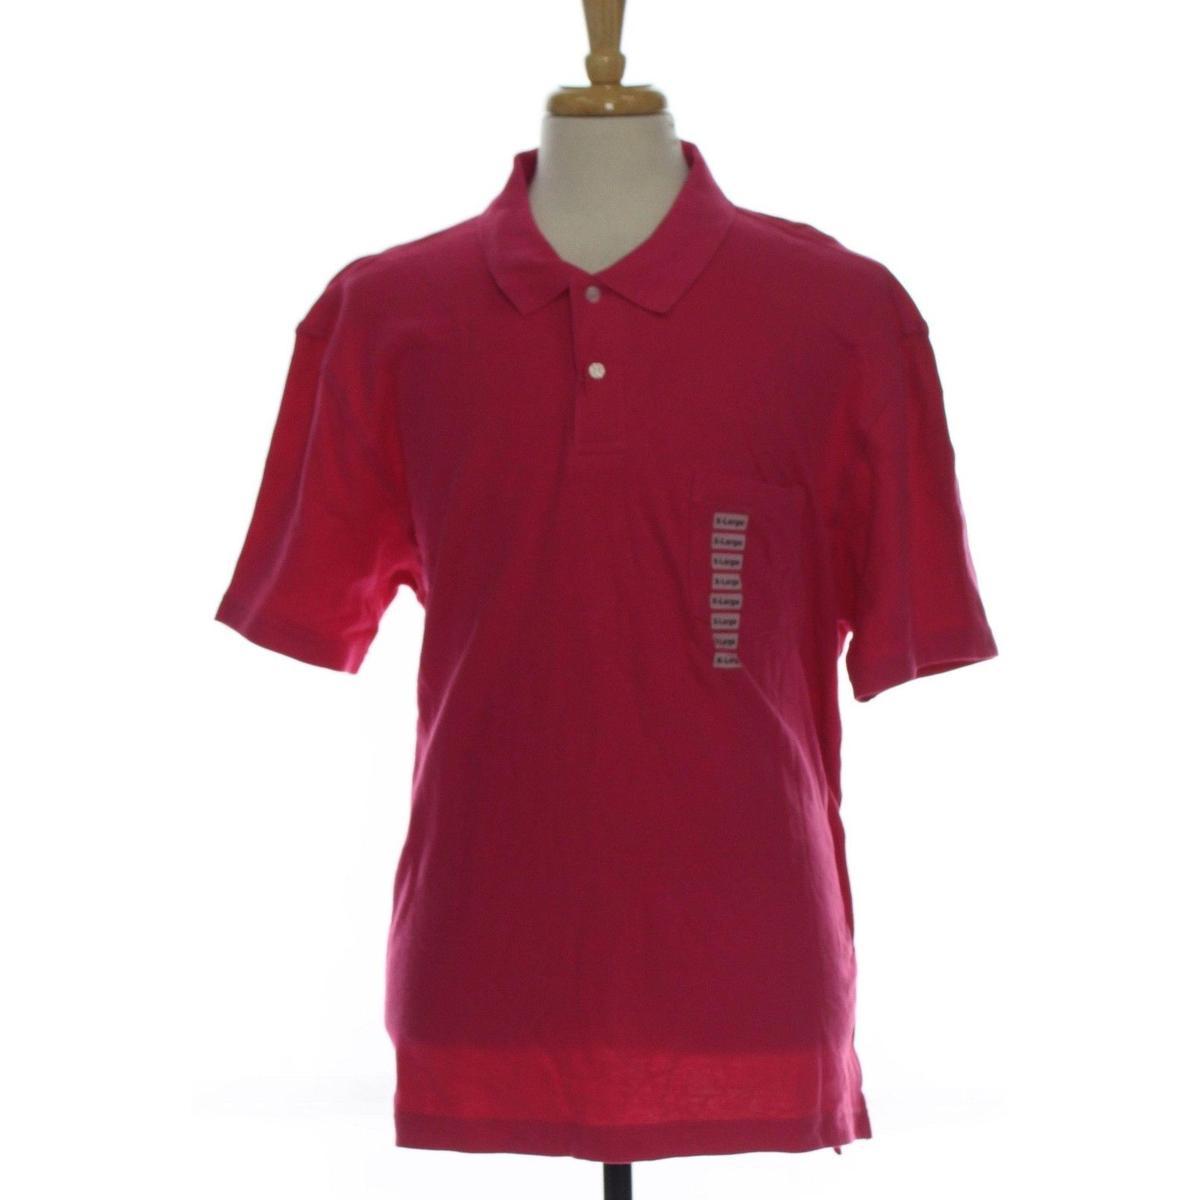 John Ashford Mens XL Pull Over Collar Polo Rugby Shirt